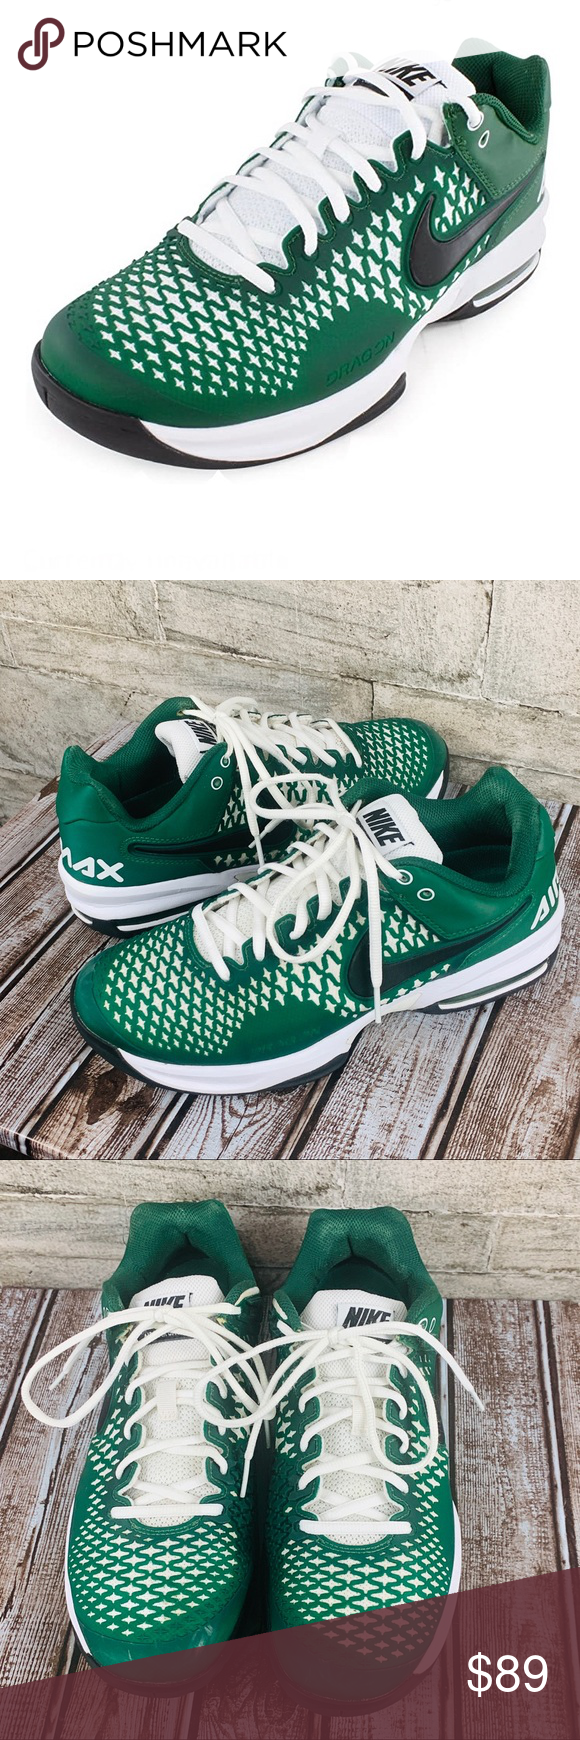 Nike Air Max Cage, Men's Tennis Shoe Gorge Size 8 Nike Air